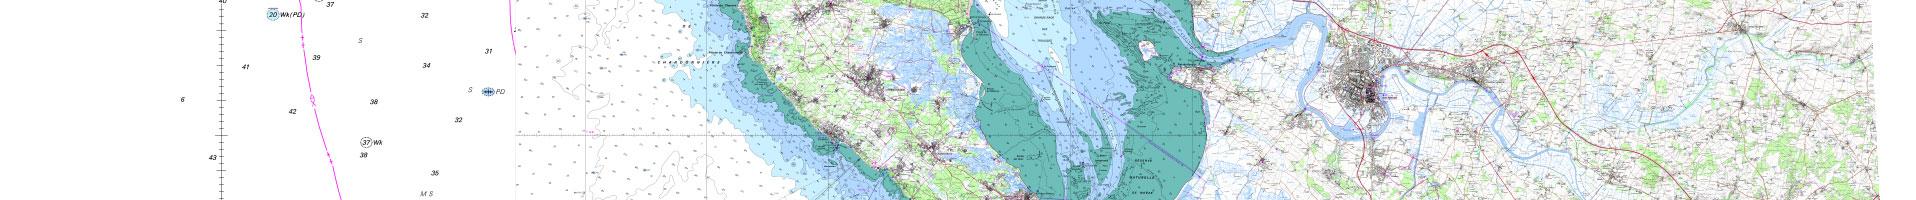 Carte littorale / SHOM / IGN 1er niveau d'agrandissement